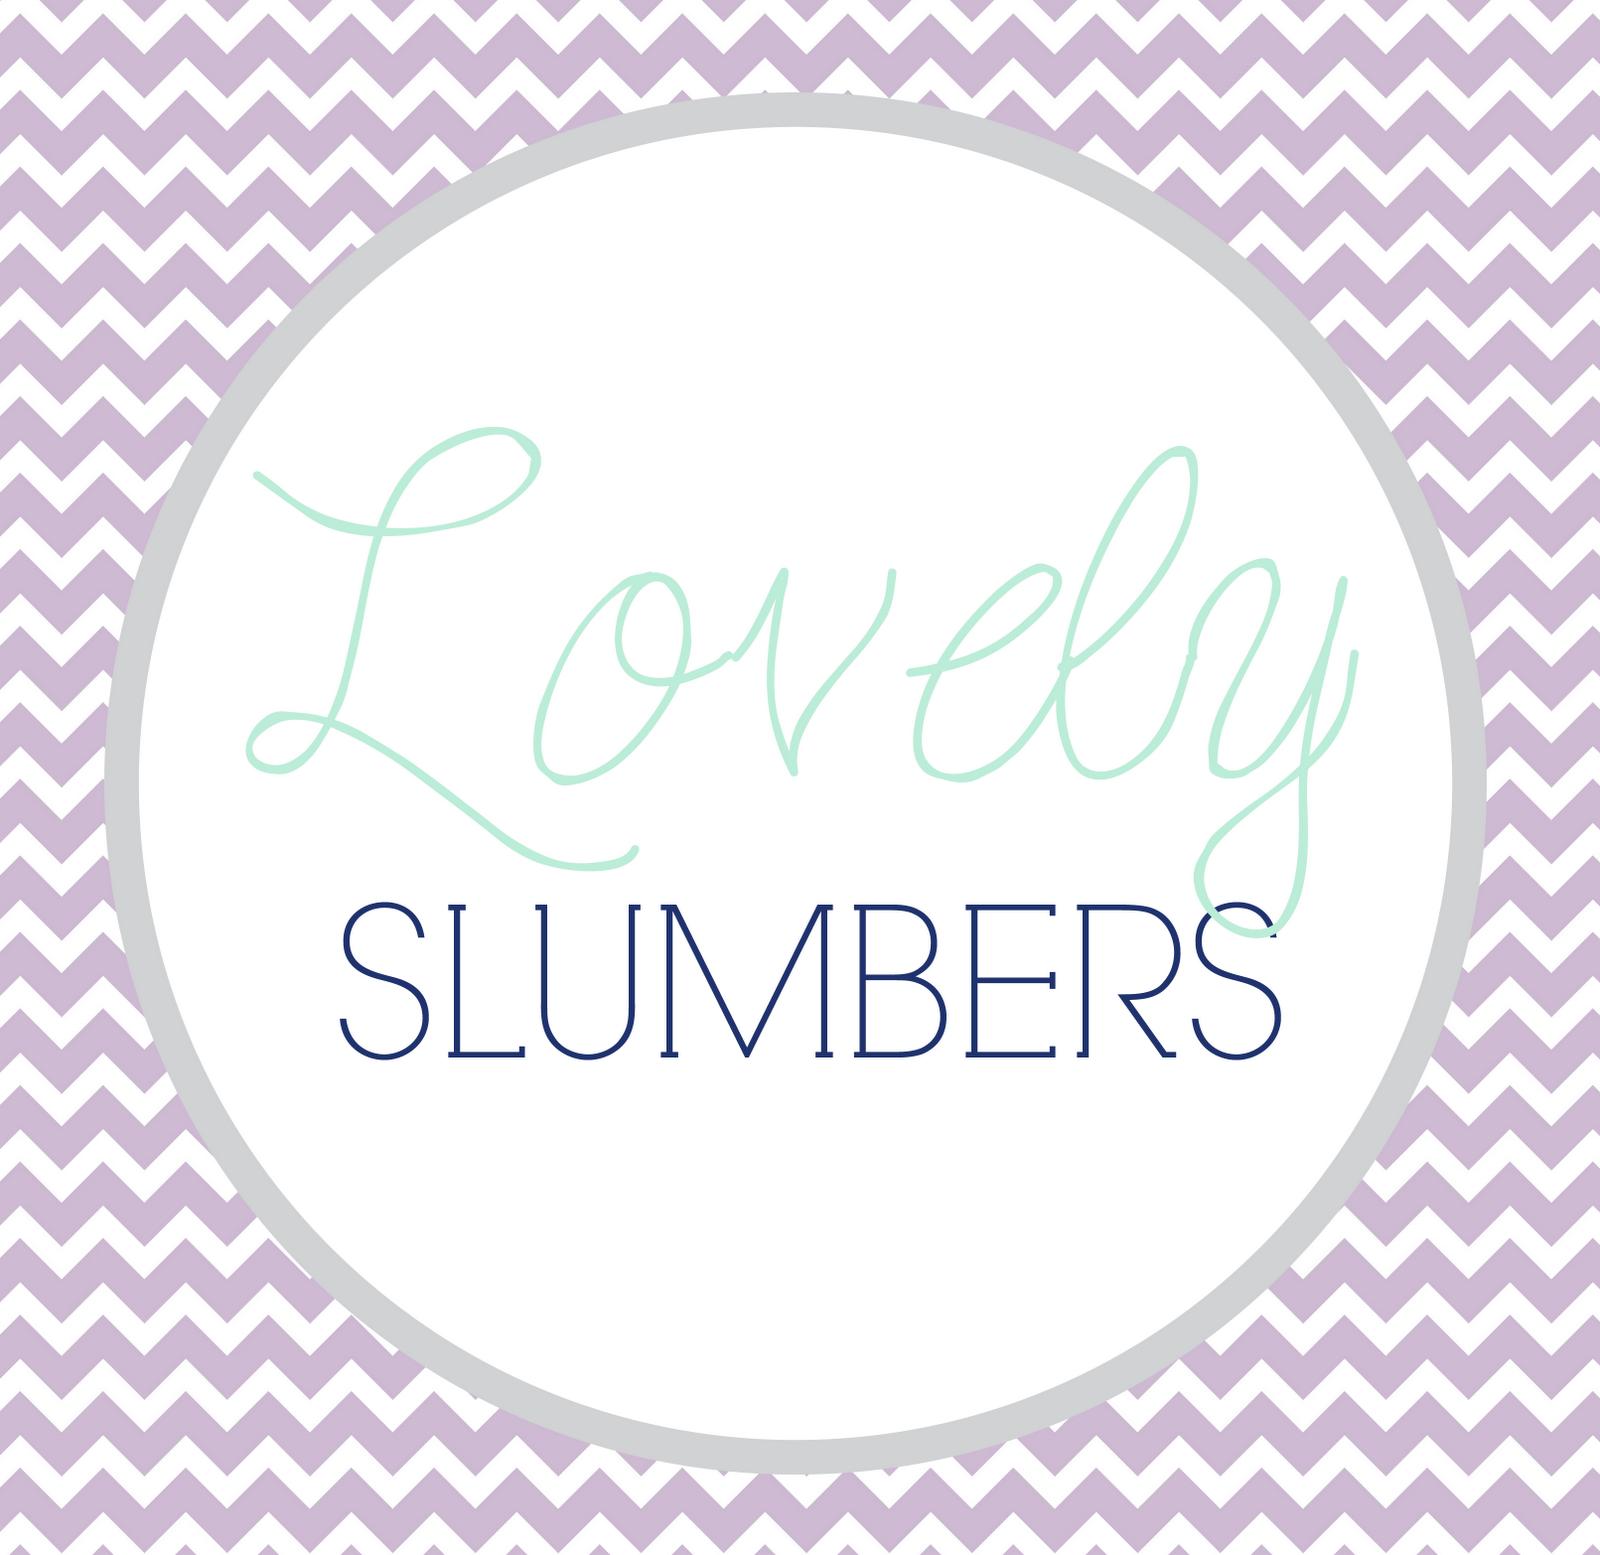 Lovely Slumbers